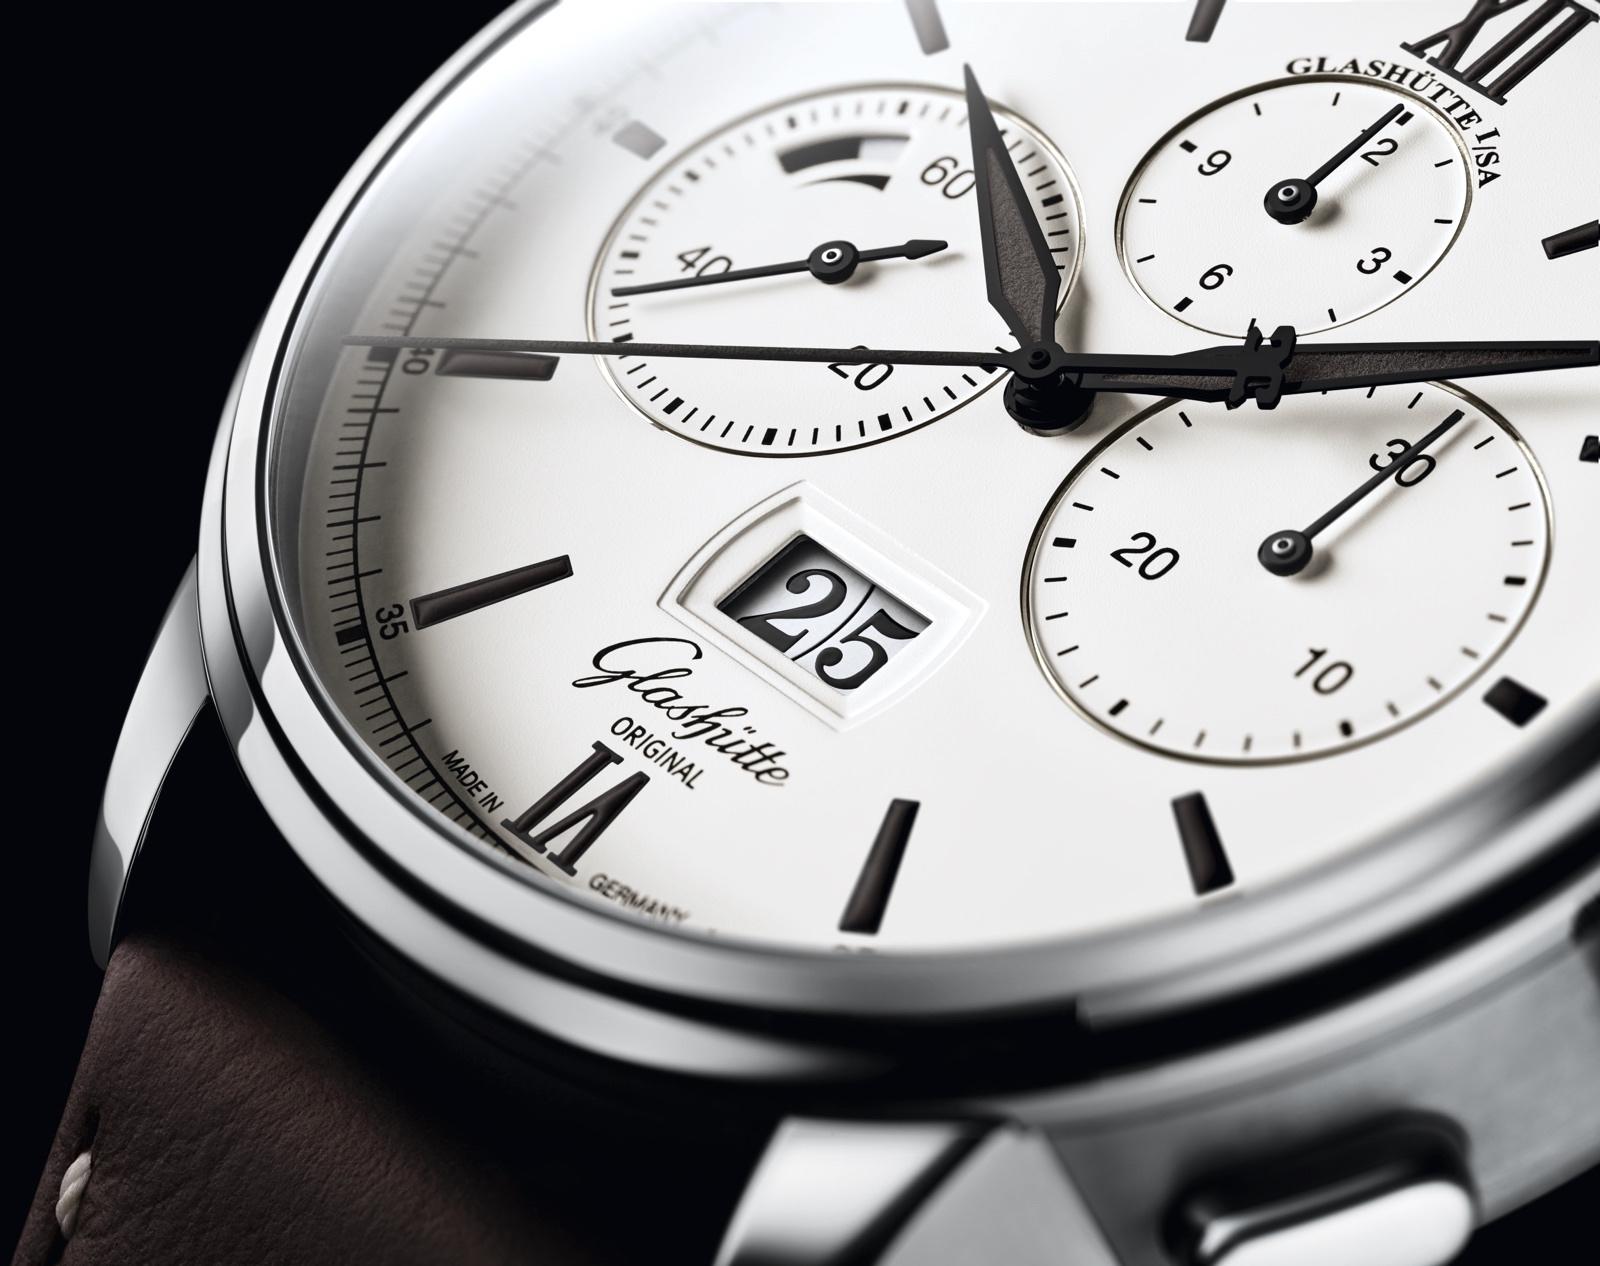 Baselworld 2018 GO Senator Chronograph Panorama Date Detalle